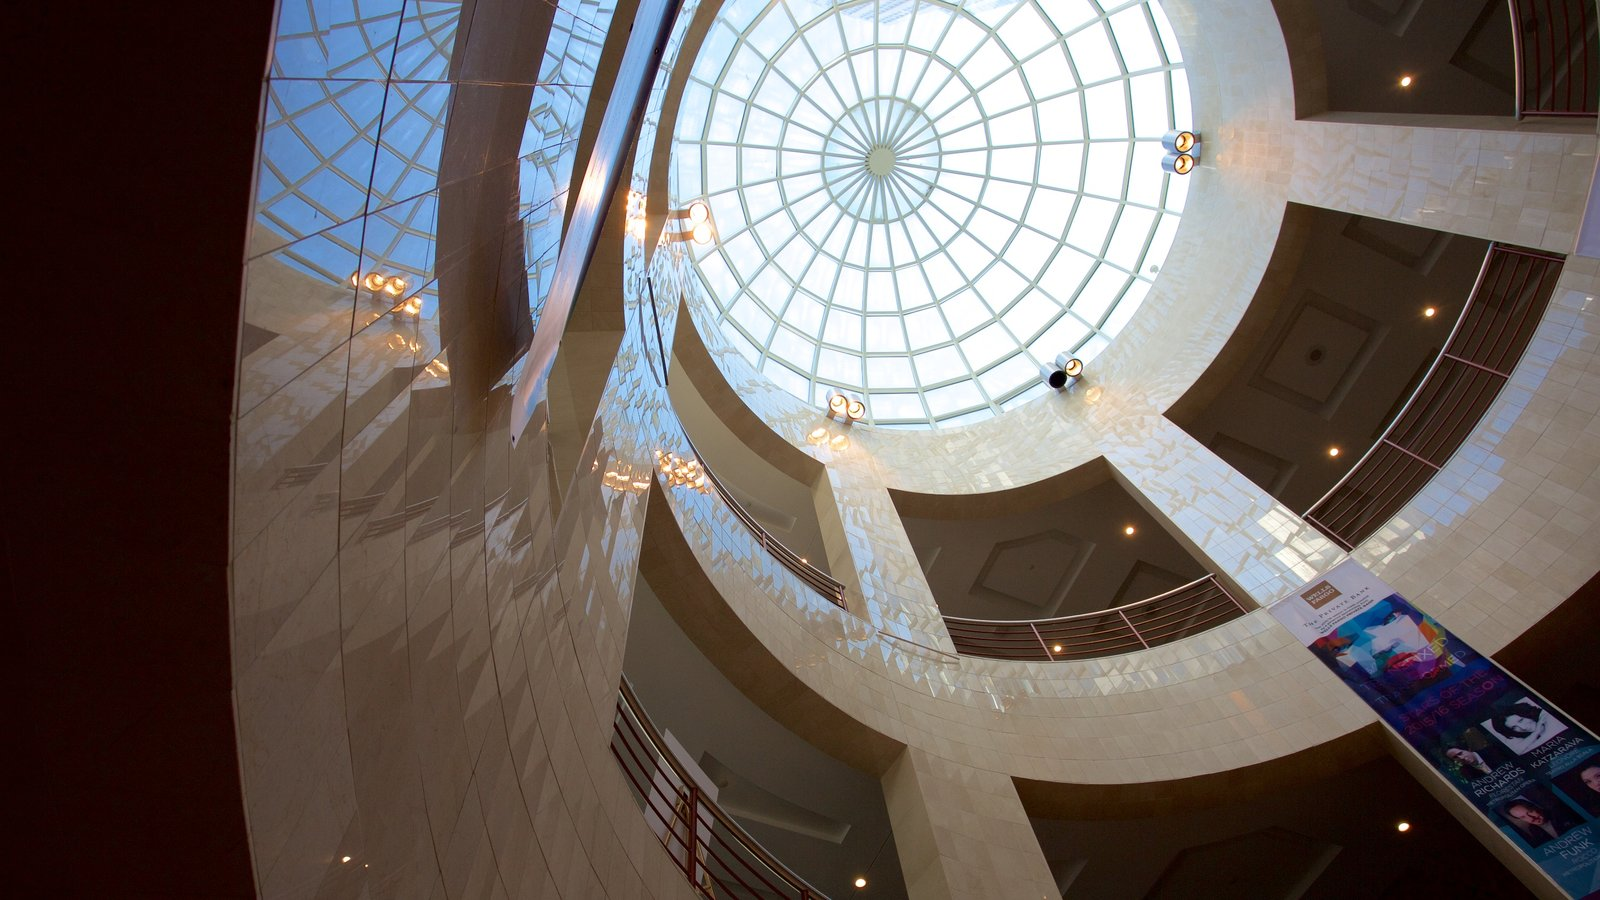 Blumenthal Performing Arts Center caracterizando vistas internas e arquitetura moderna